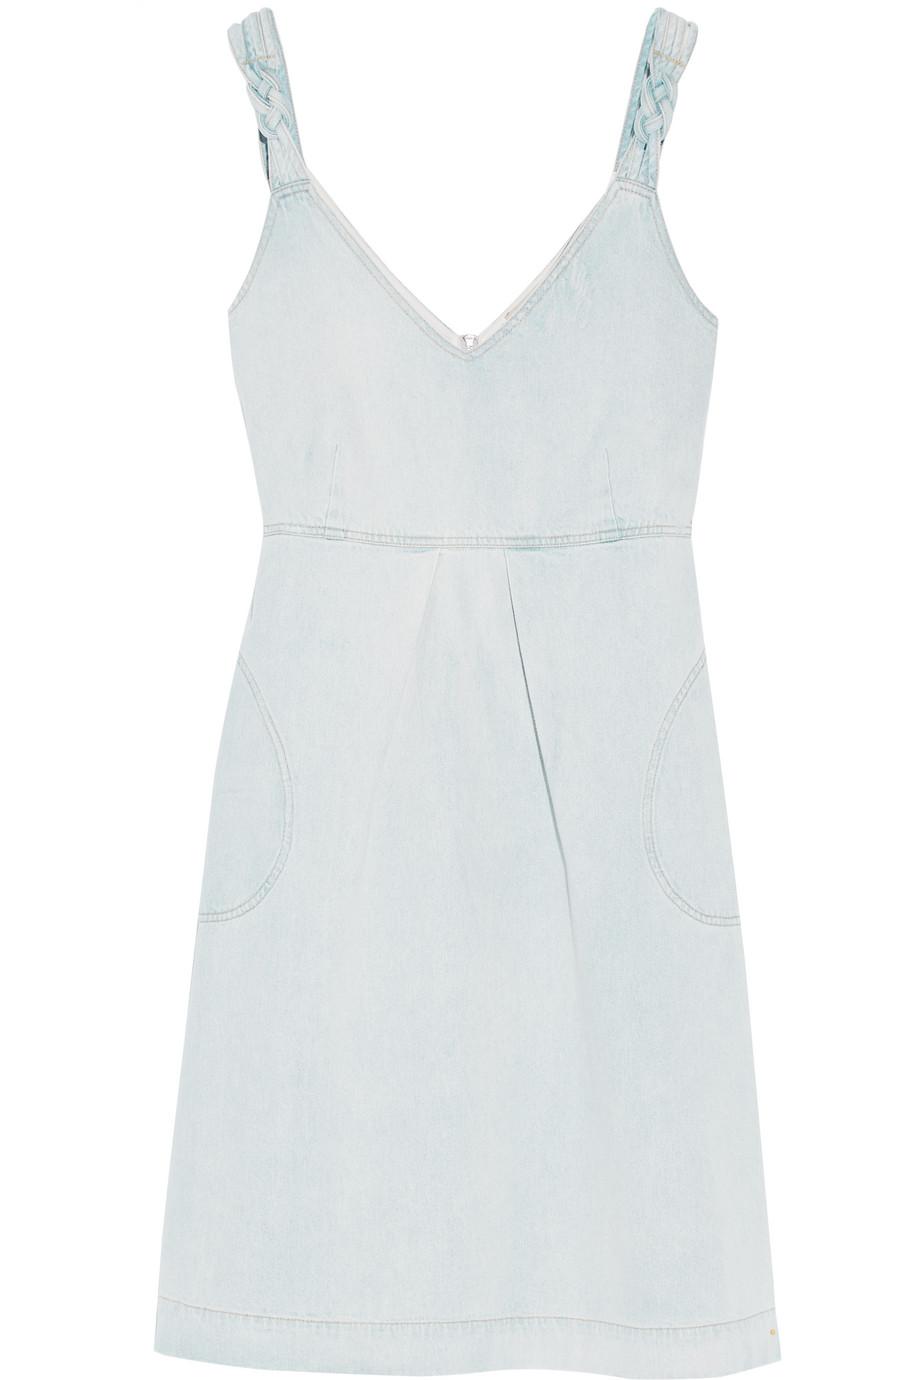 SEA Denim Dress, Light Denim, Women's, Size: 2